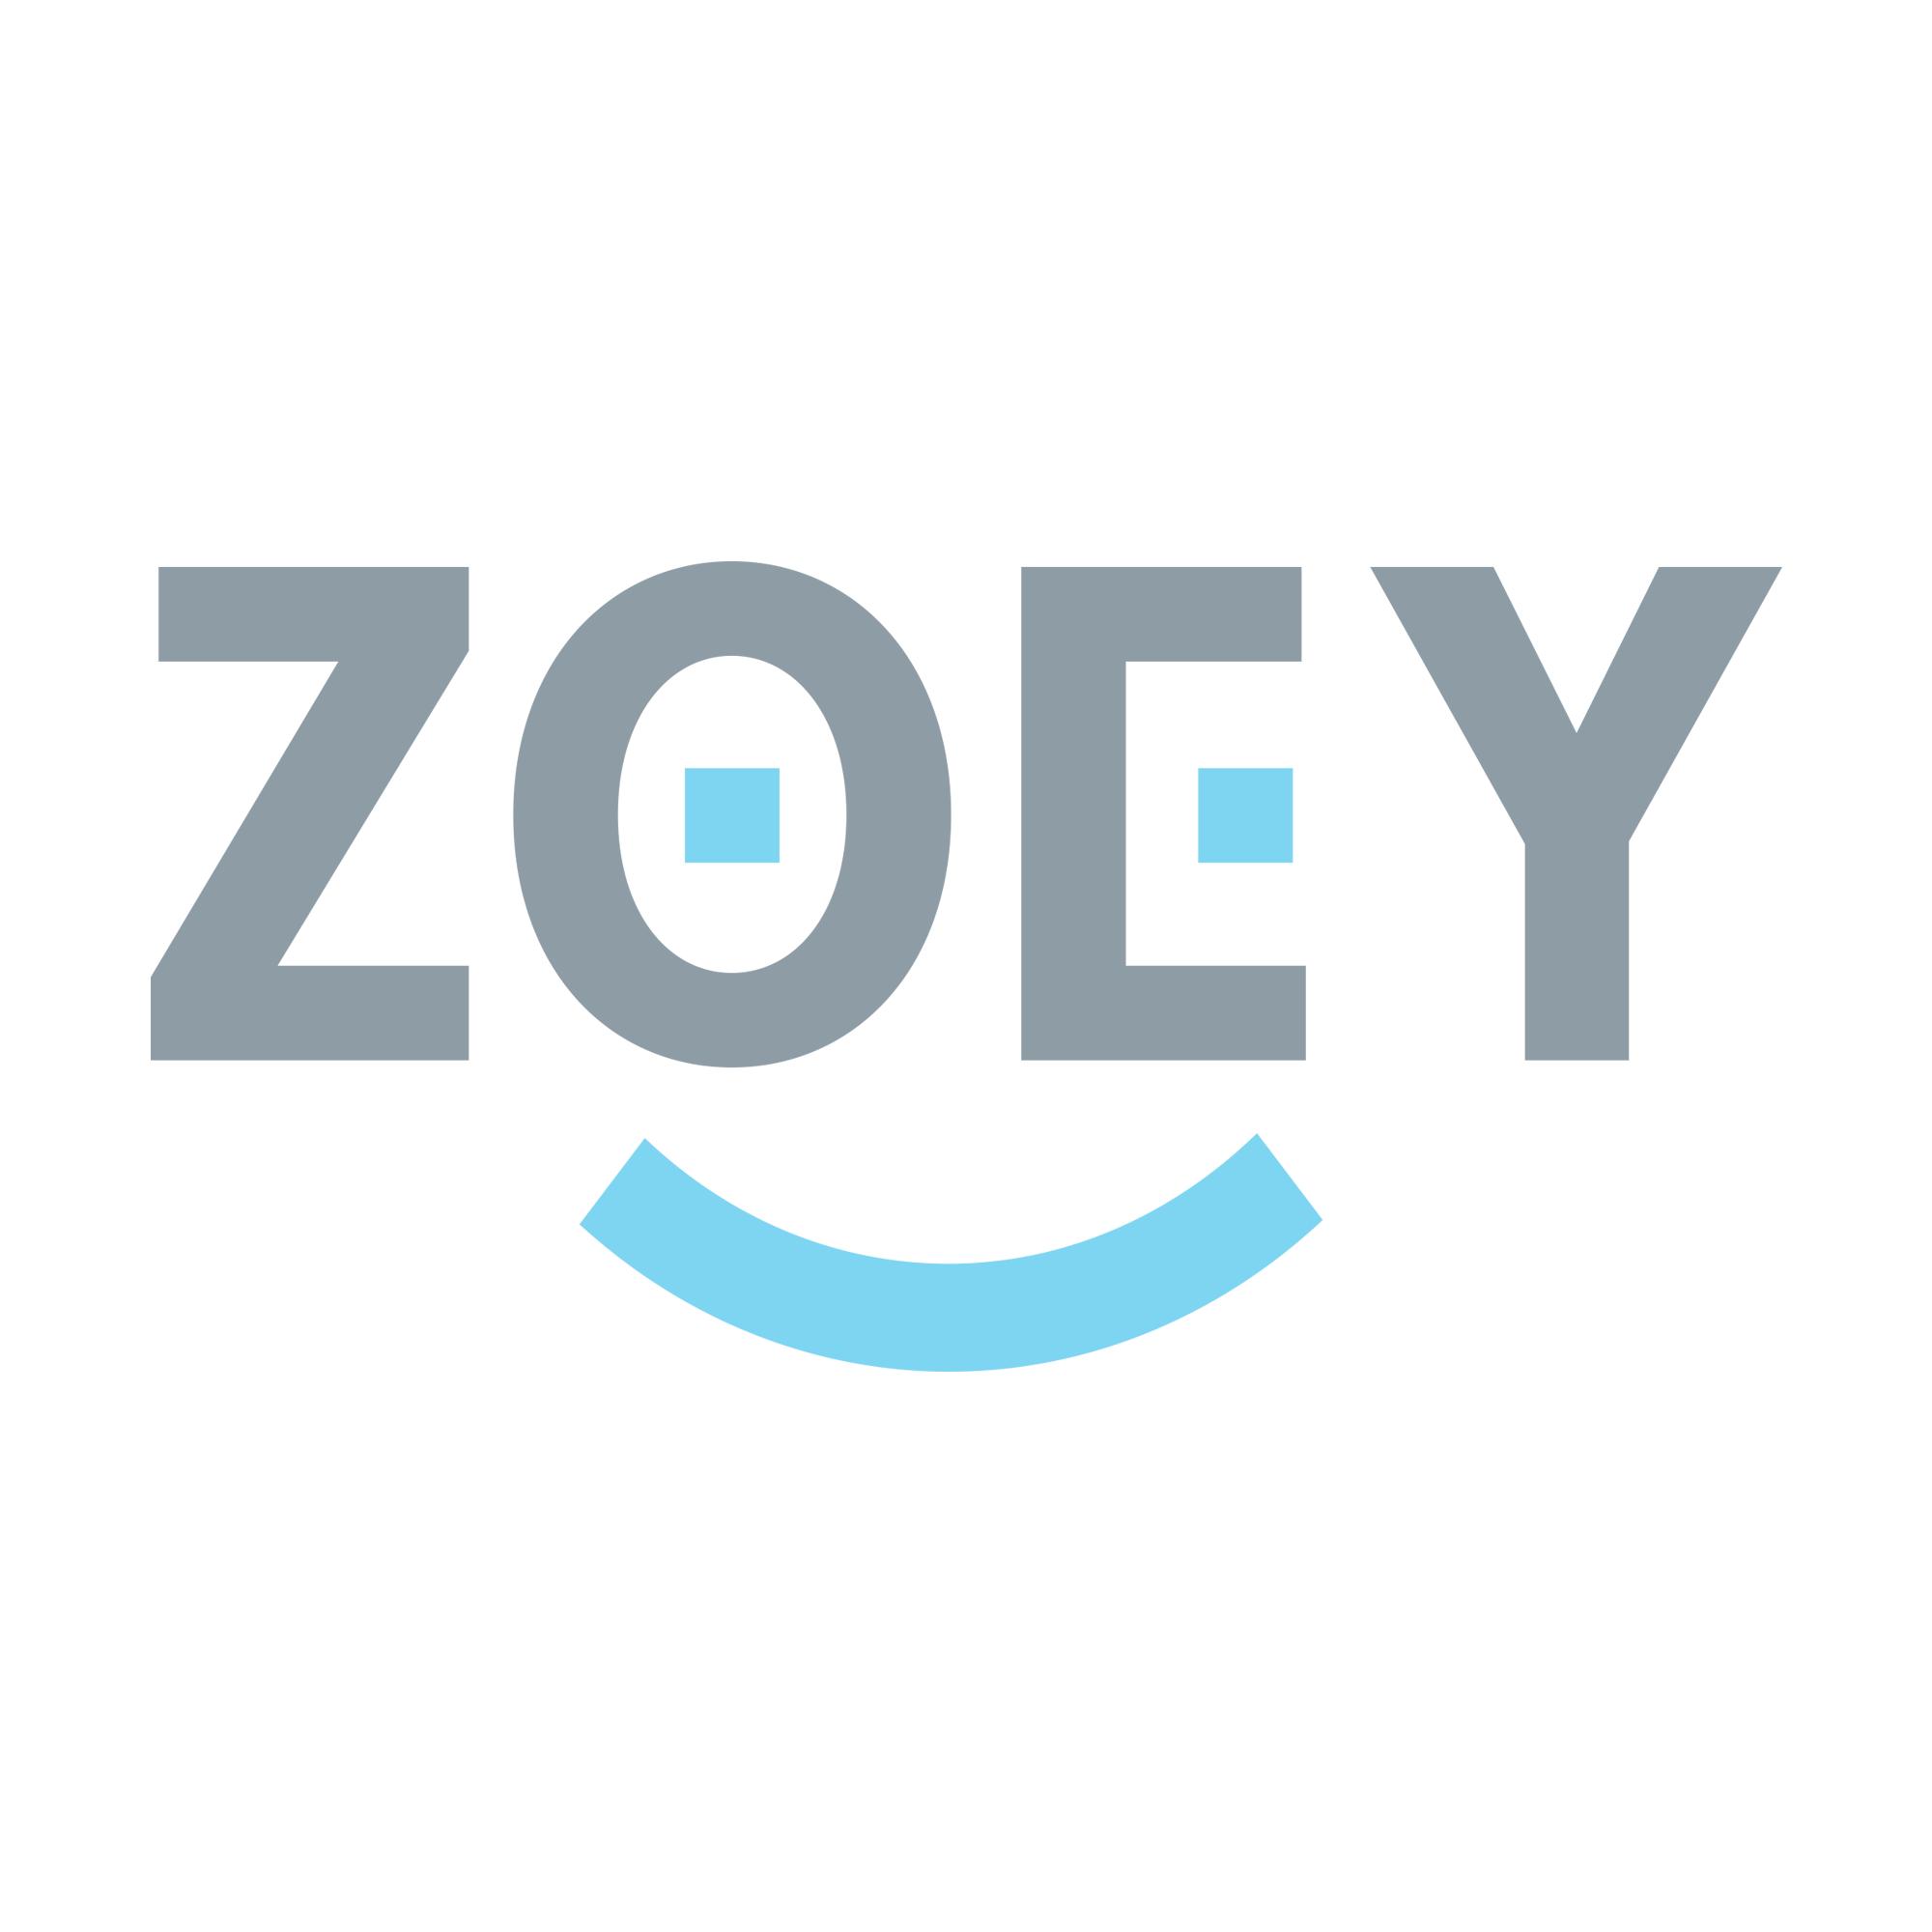 Zoey logo